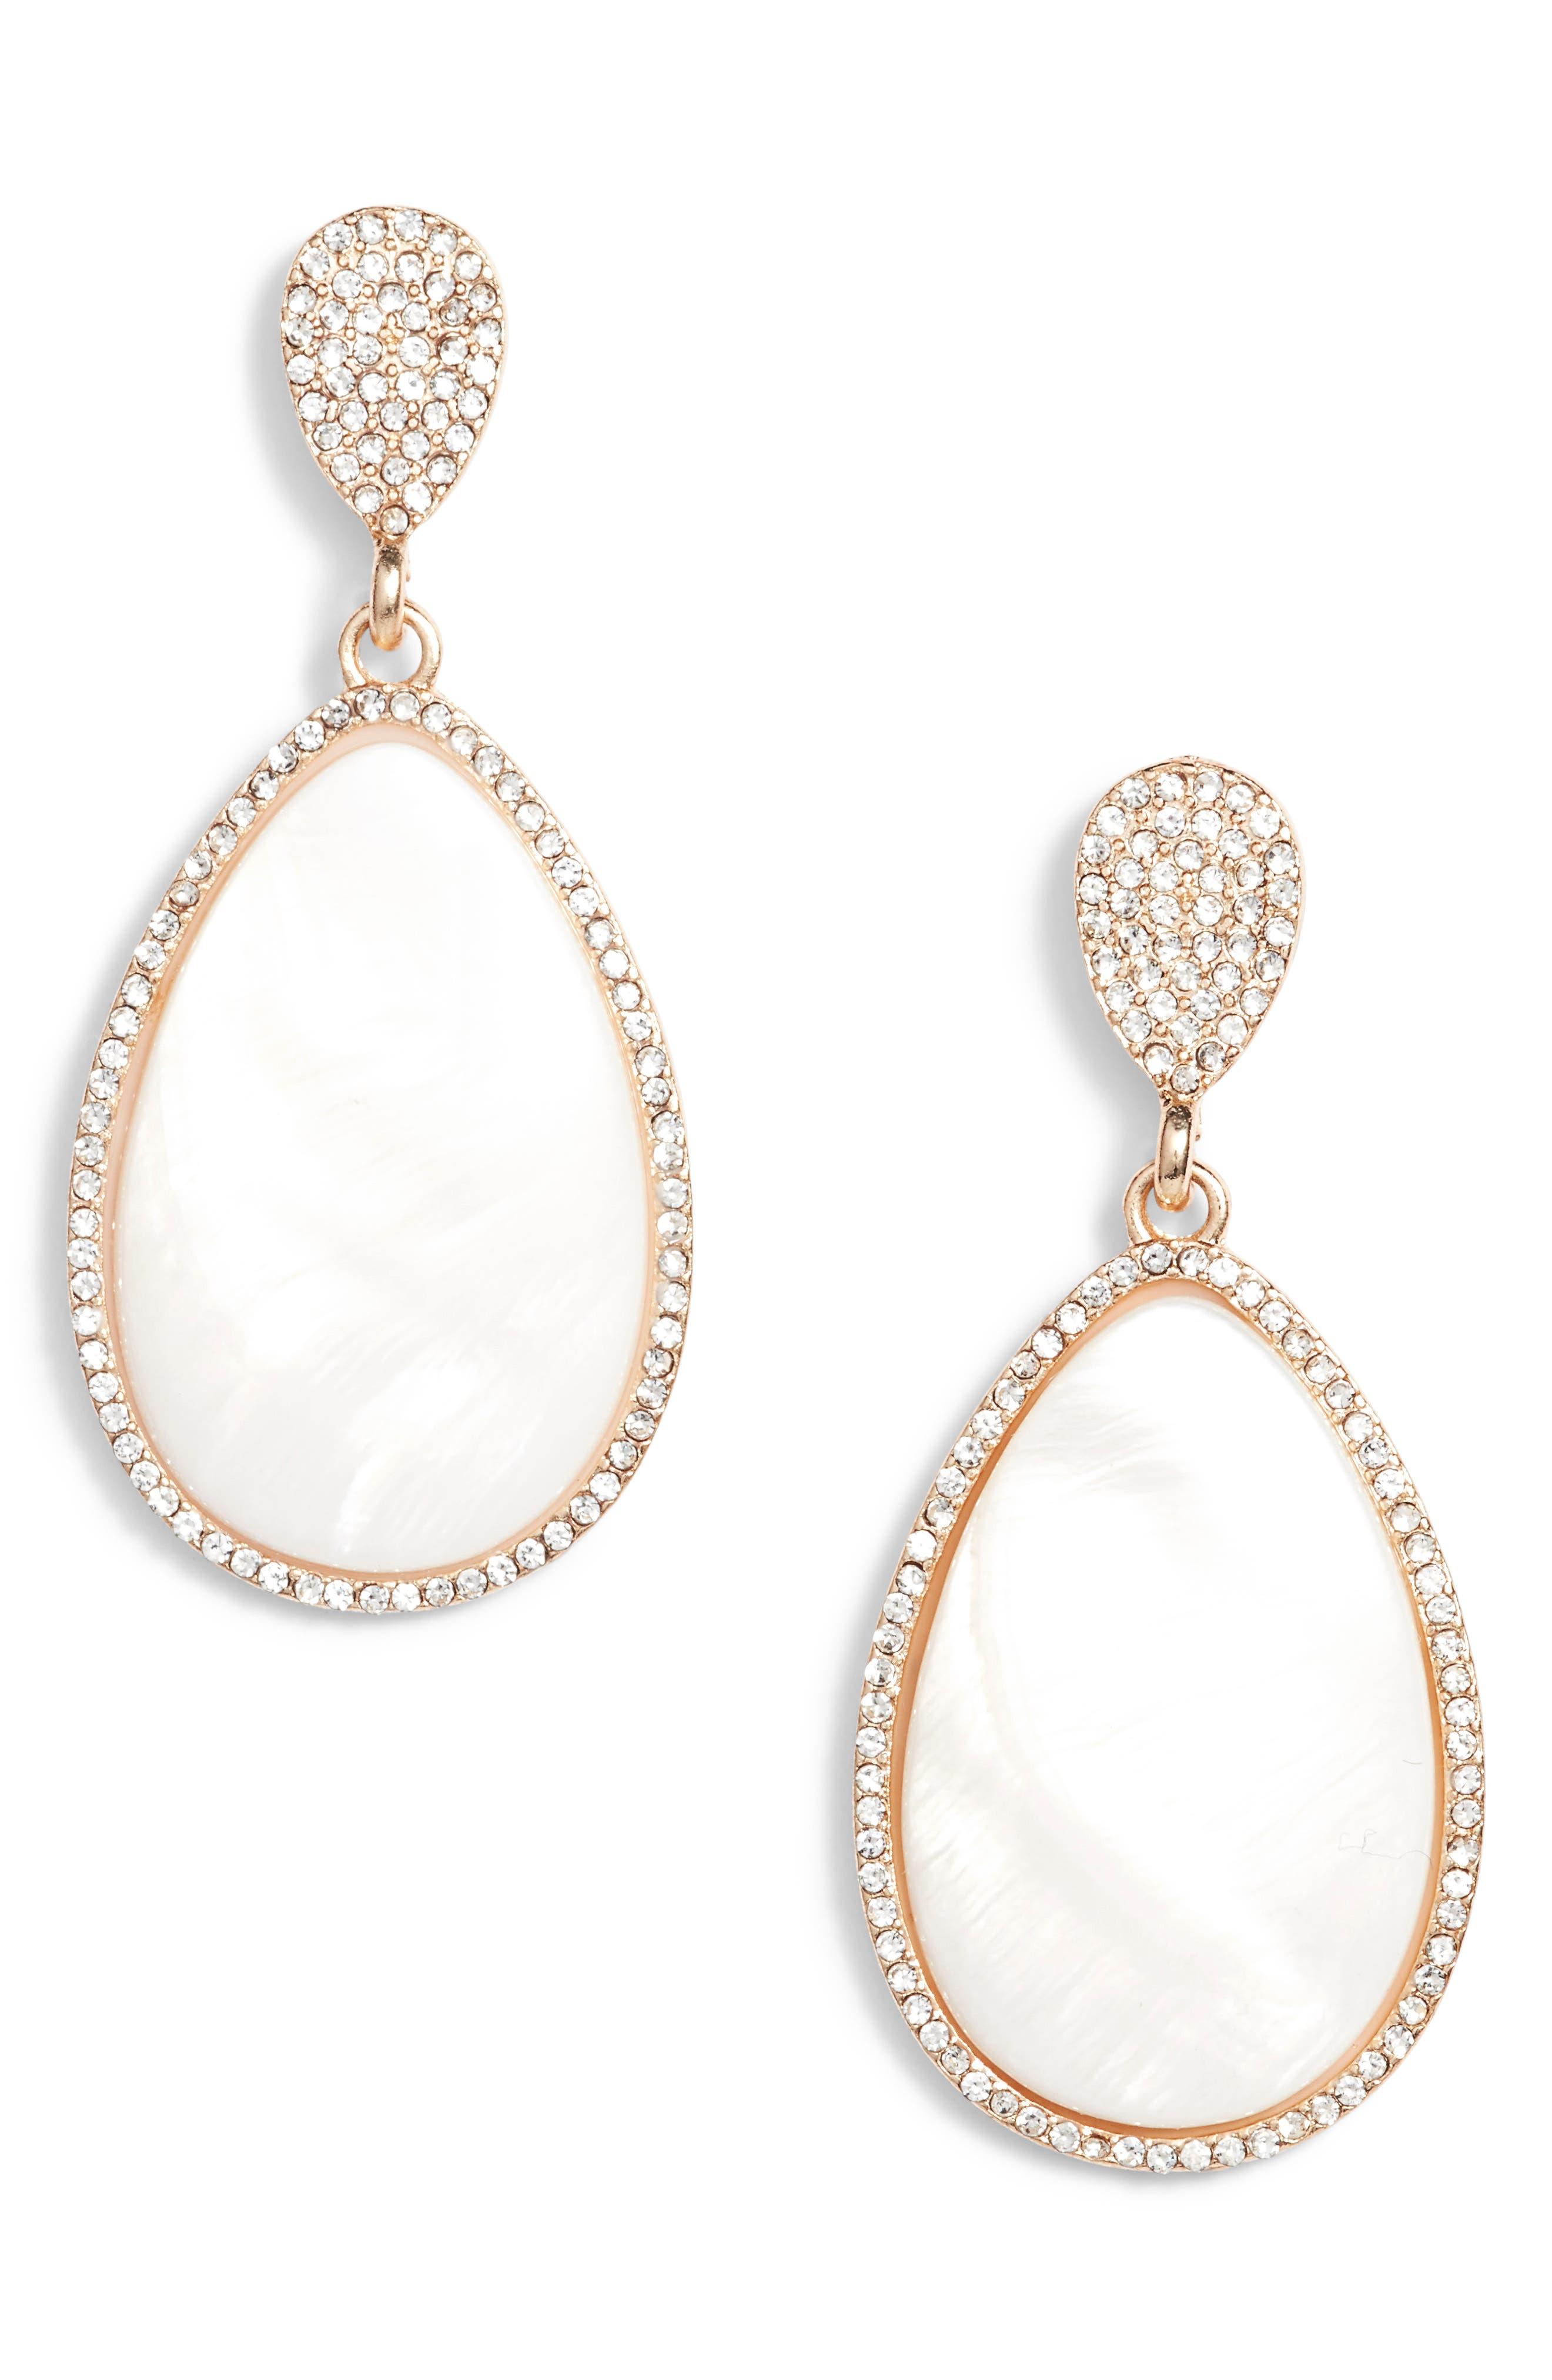 Mother-of-Pearl Drop Earrings,                             Main thumbnail 1, color,                             710